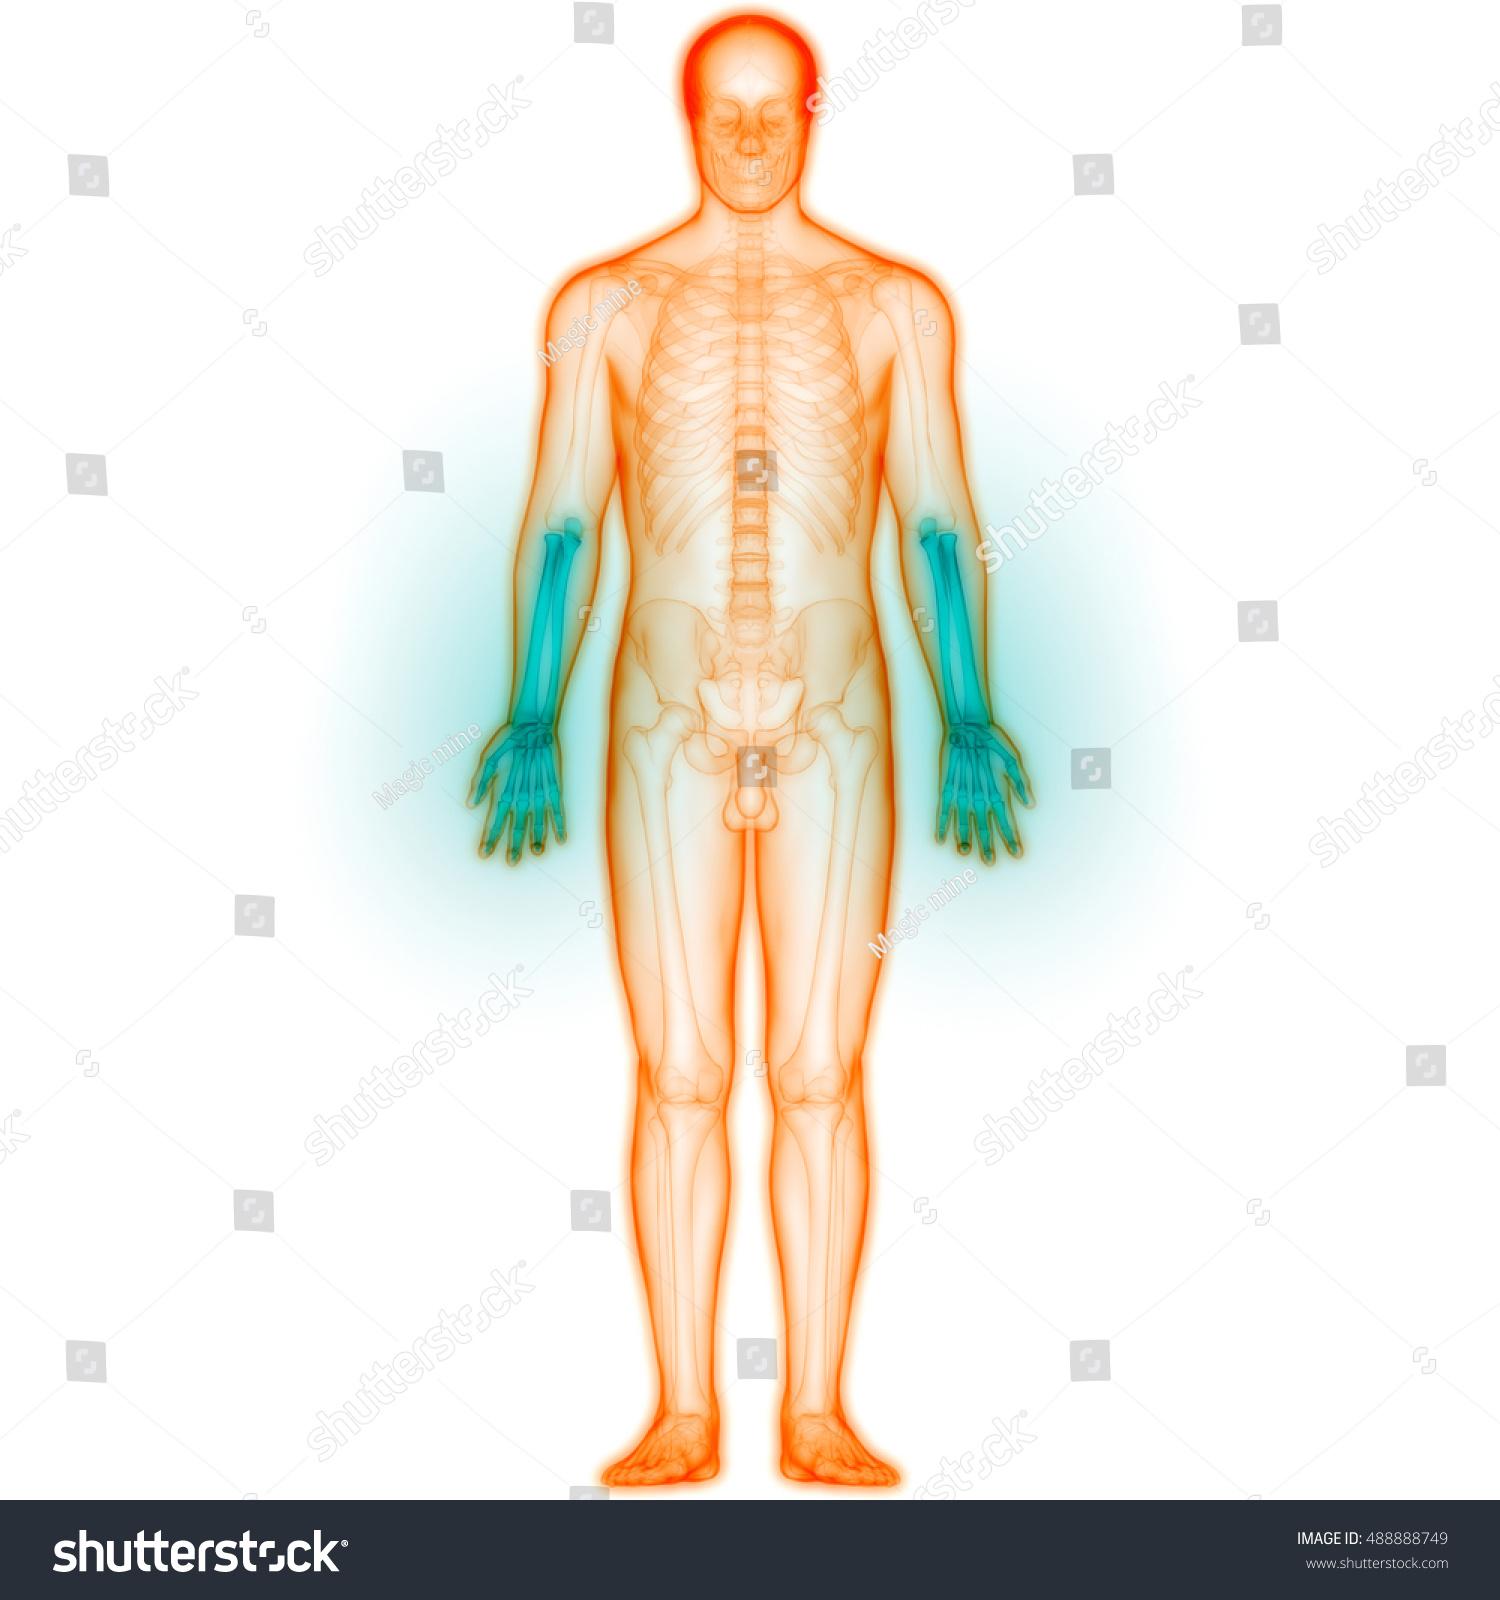 Human Body Joint Pains Anatomy Hand Stock Illustration 488888749 ...